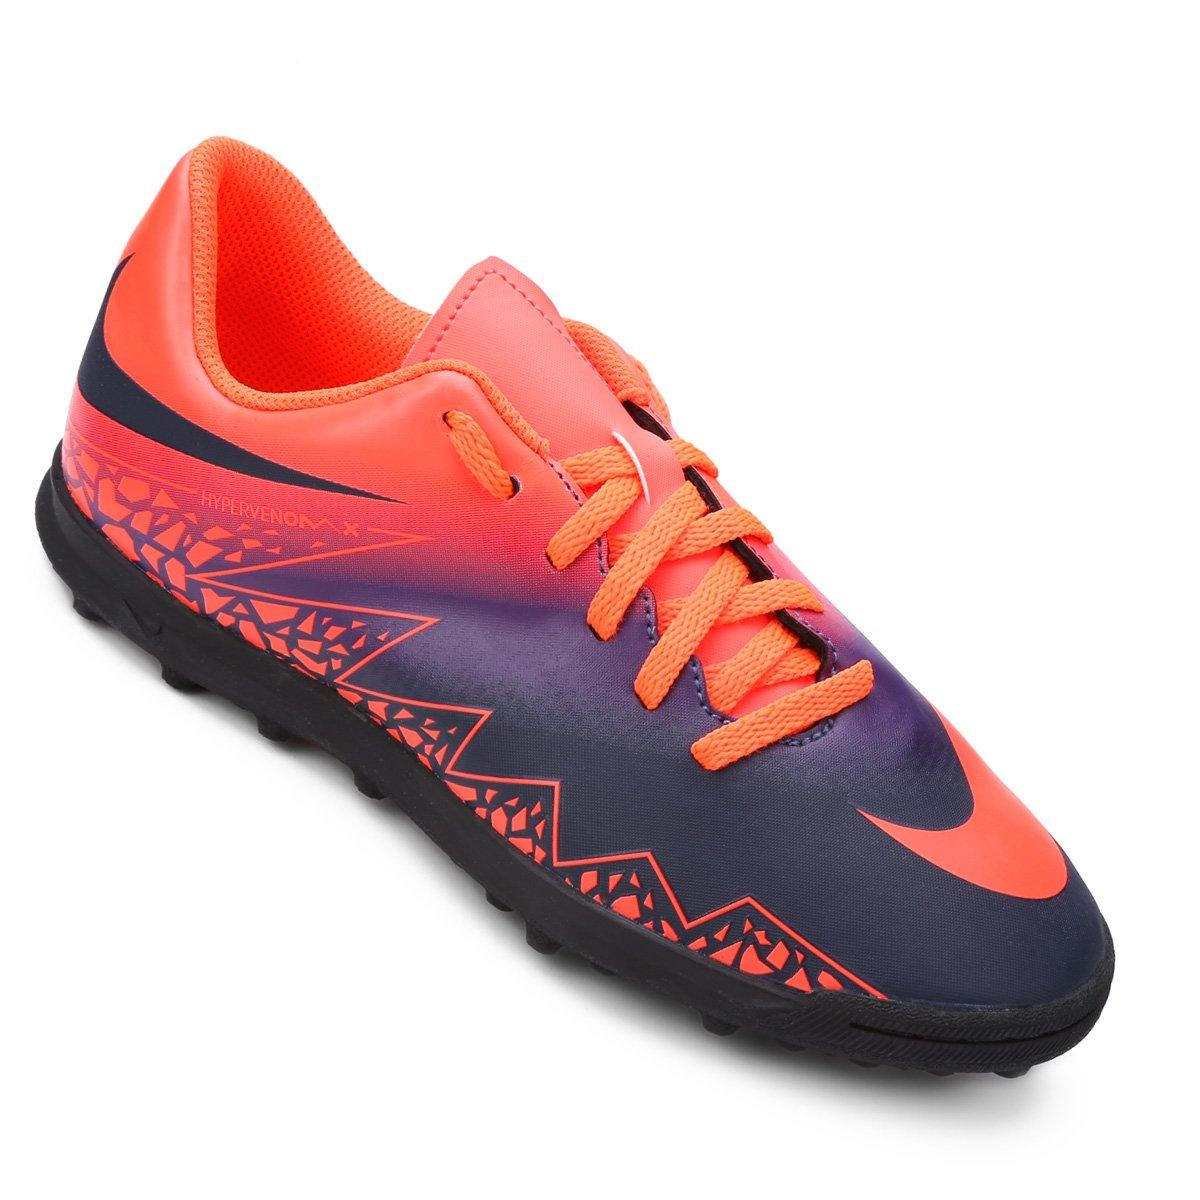 1a48ae026d492 Chuteira Society Infantil Nike Hypervenom Phade 2 TF - Compre Agora ...